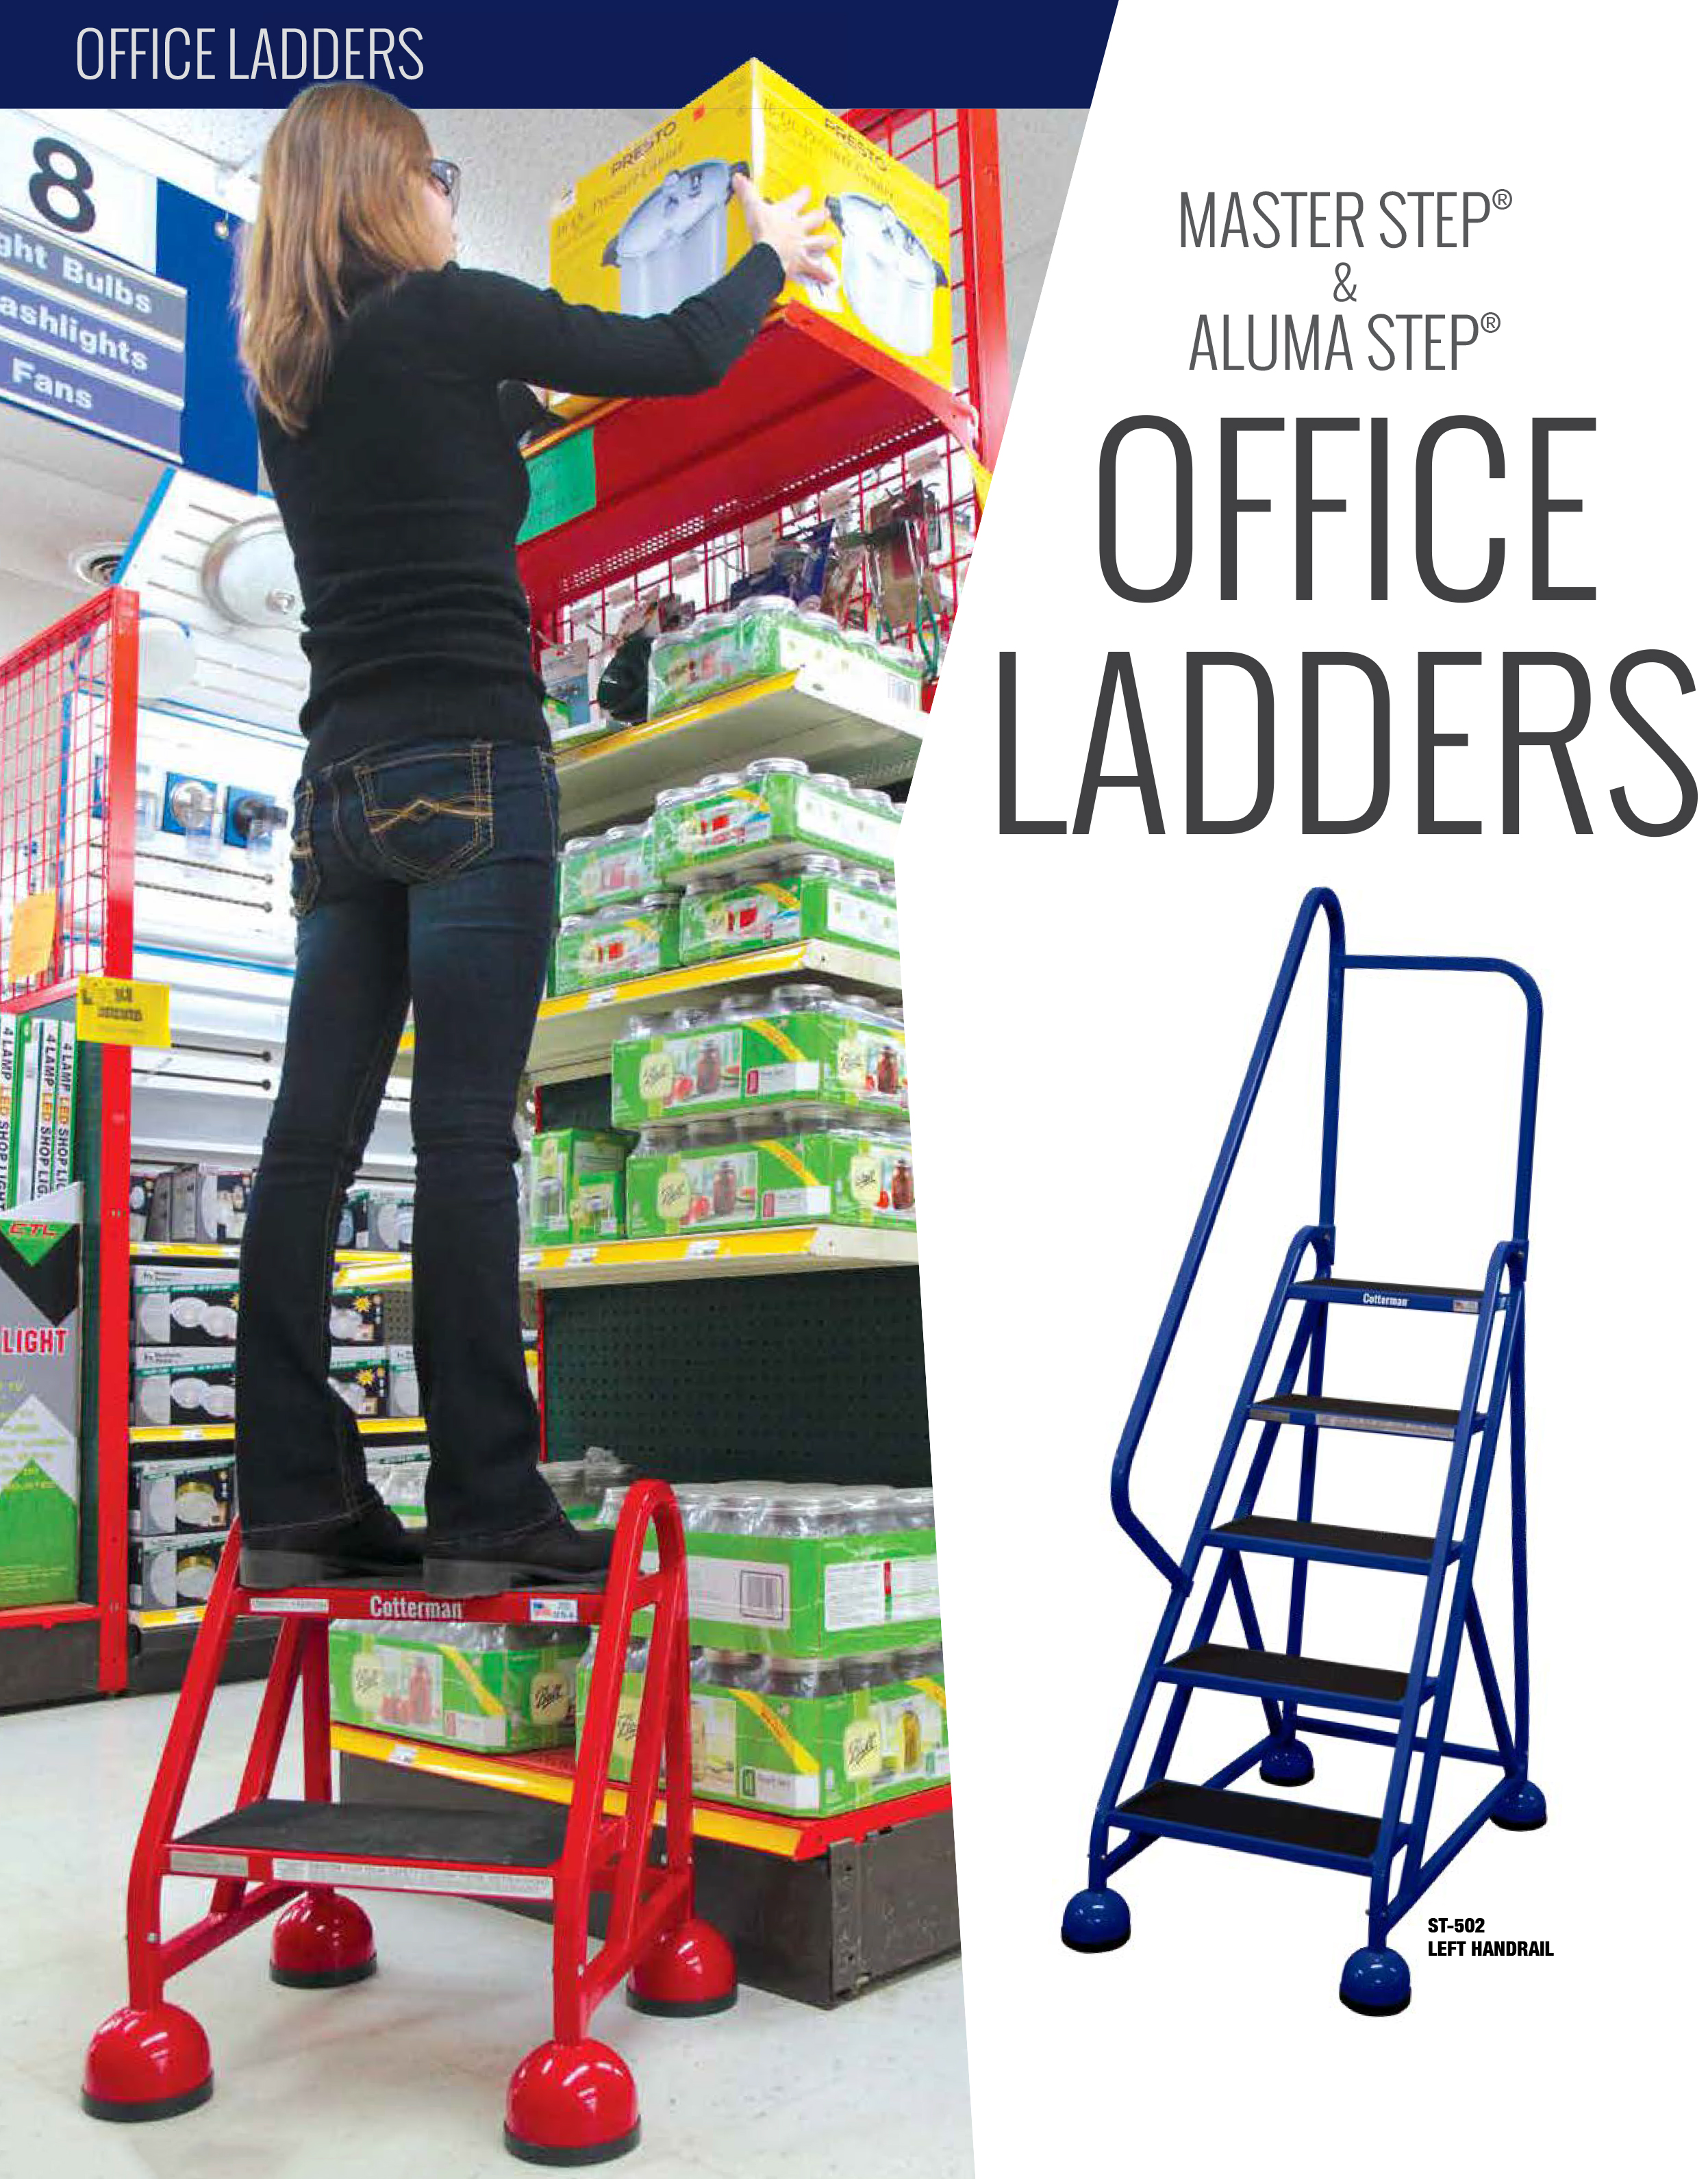 dc-105-office-ladders-2.jpg